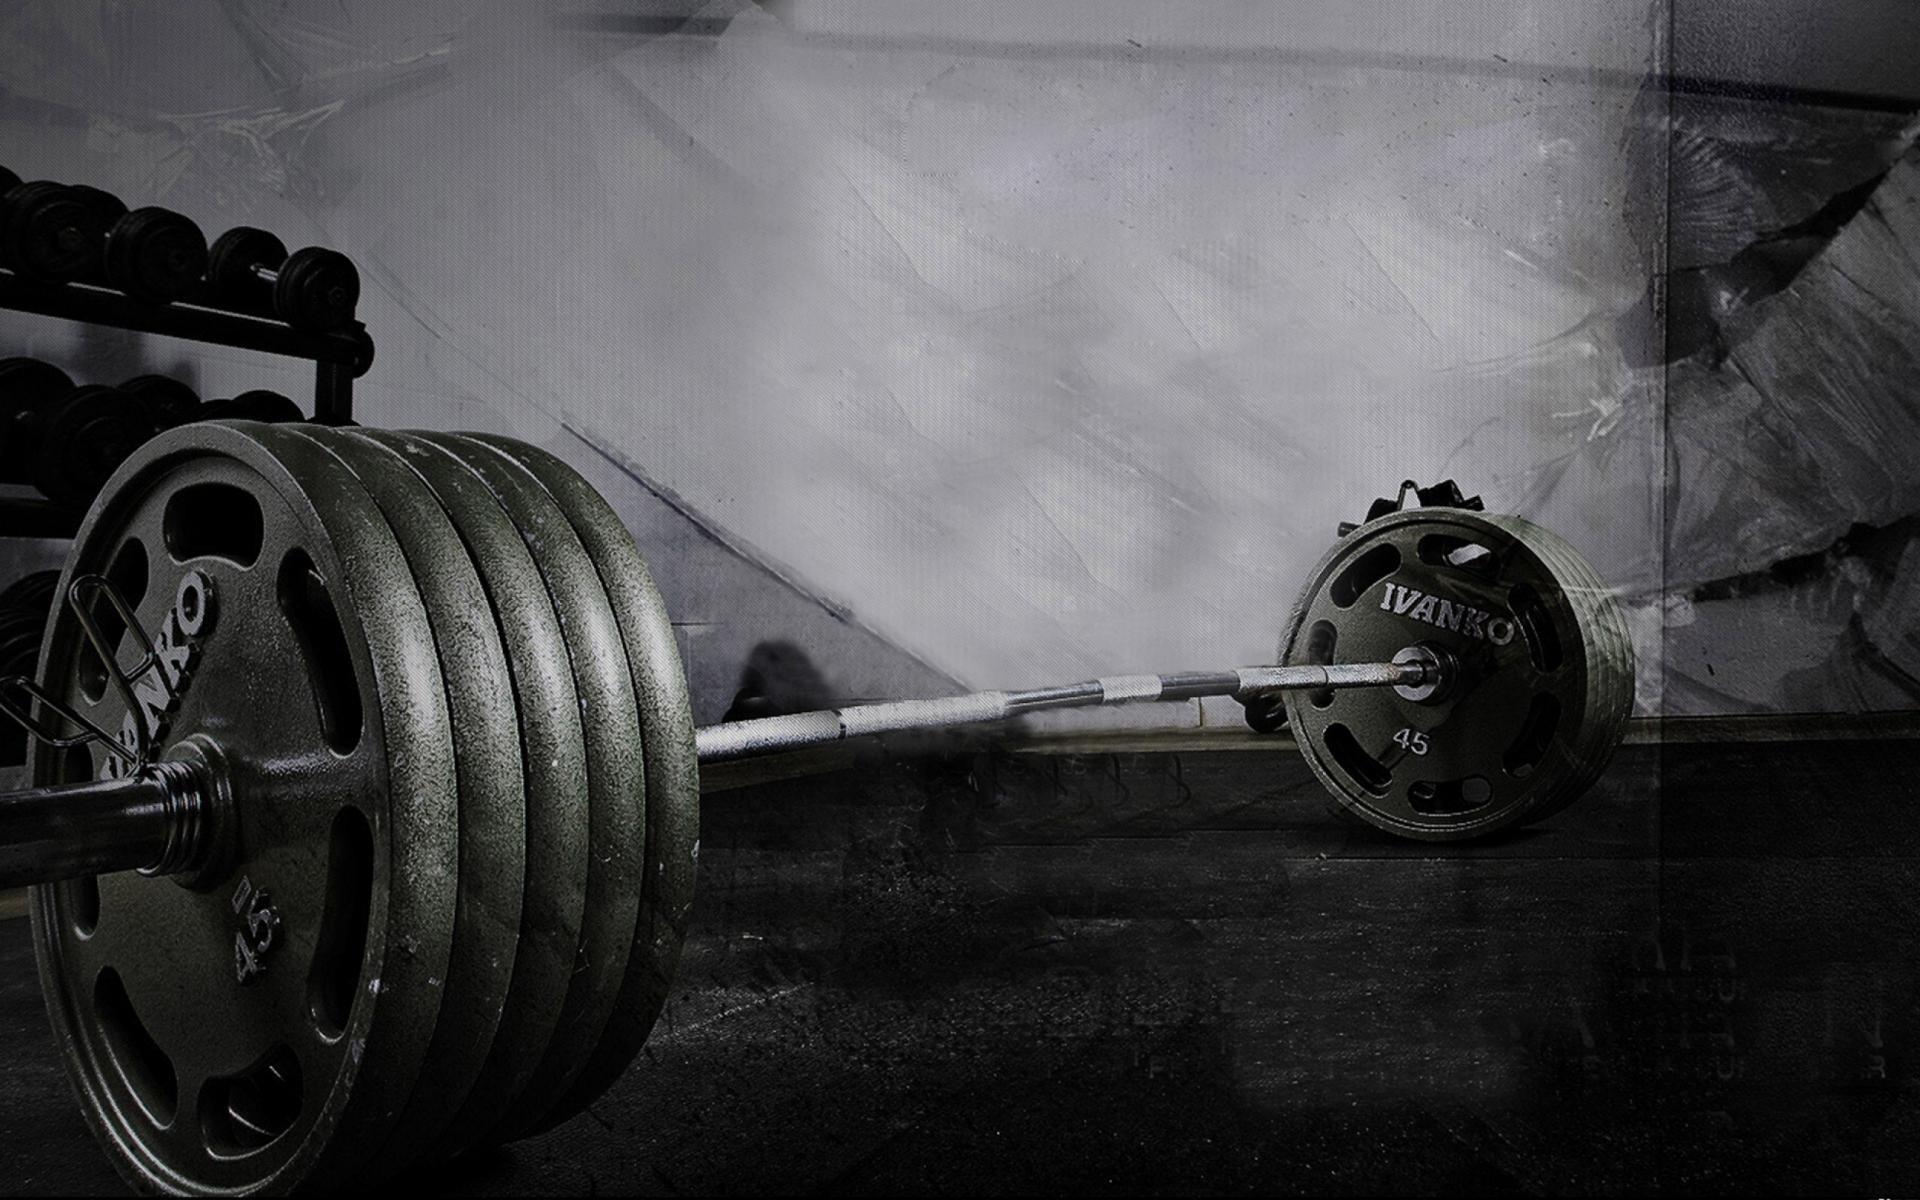 wallpaper.wiki-Weight-Bar-Gym-Workout-1920×1200-PIC-